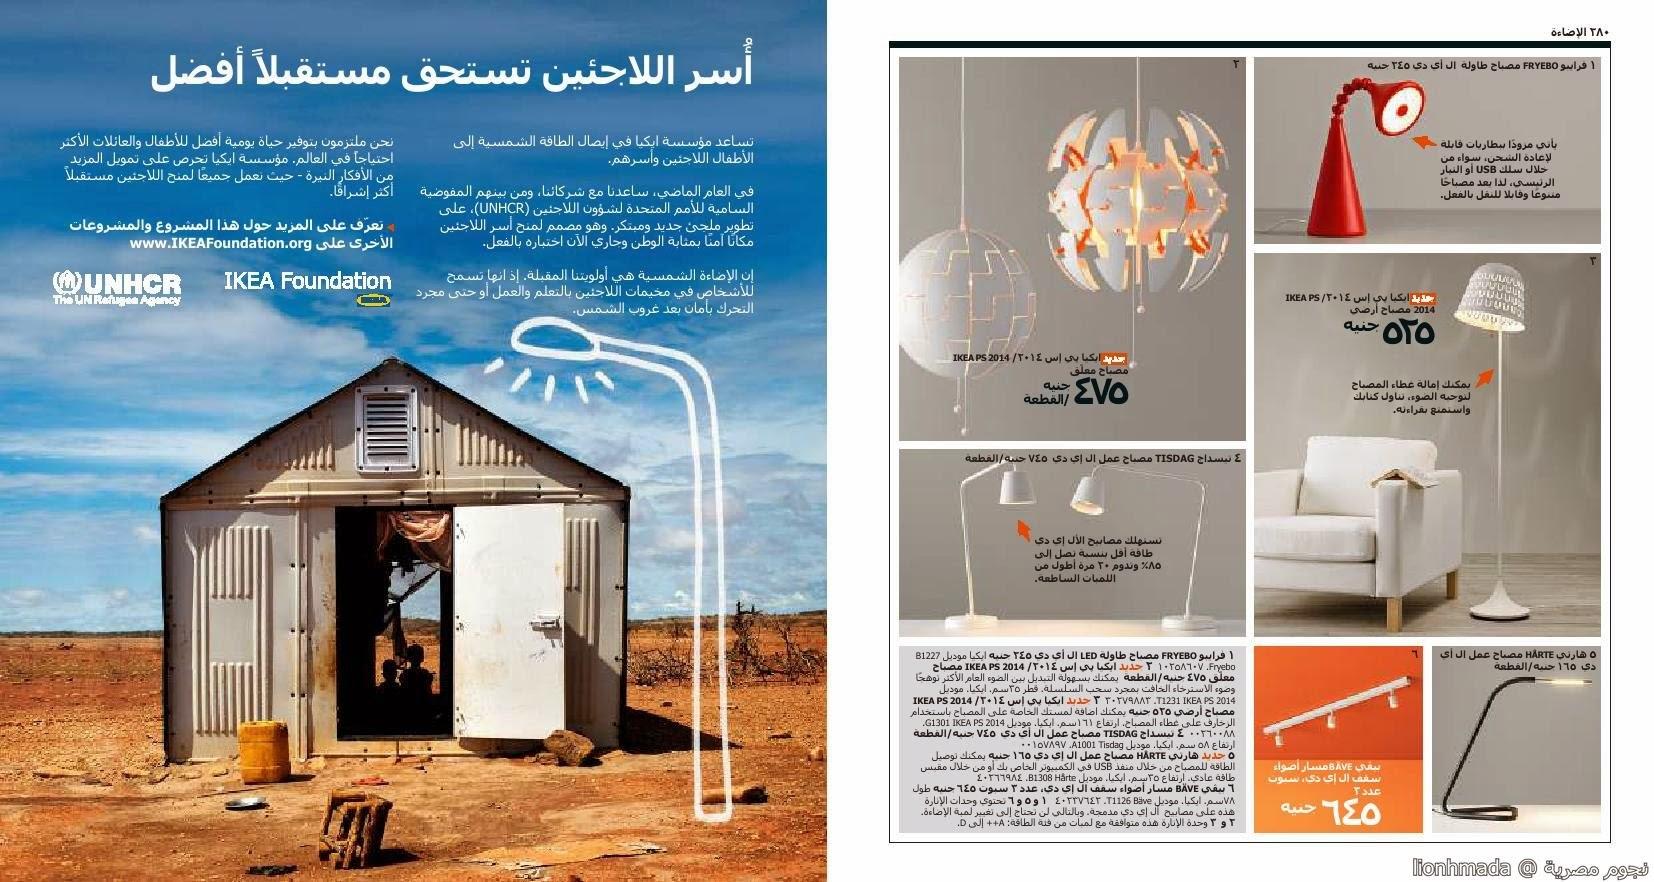 imga24421131e1c8788db226adff0e844d5 صور كتالوج ايكيا مصر ikia للديكورات